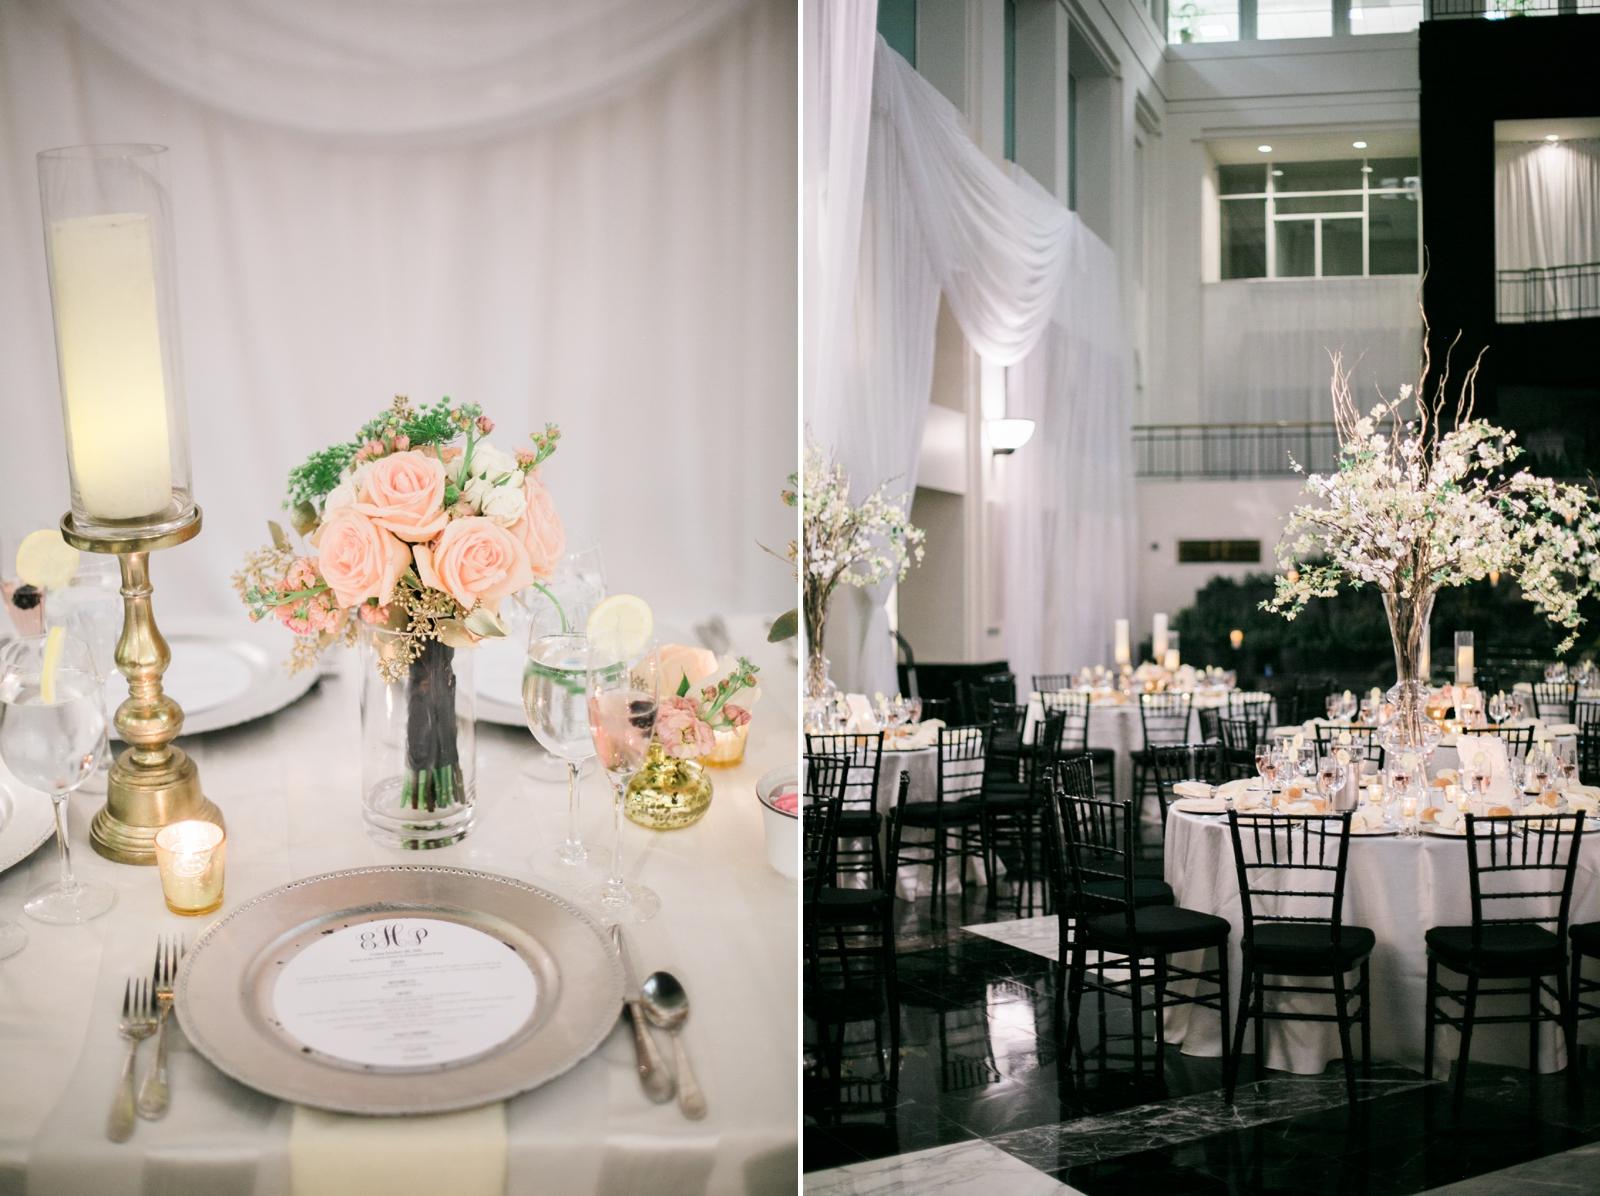 atrium at curtis center wedding photographer philadelphia wedding photographer shannon griffin_0049.jpg